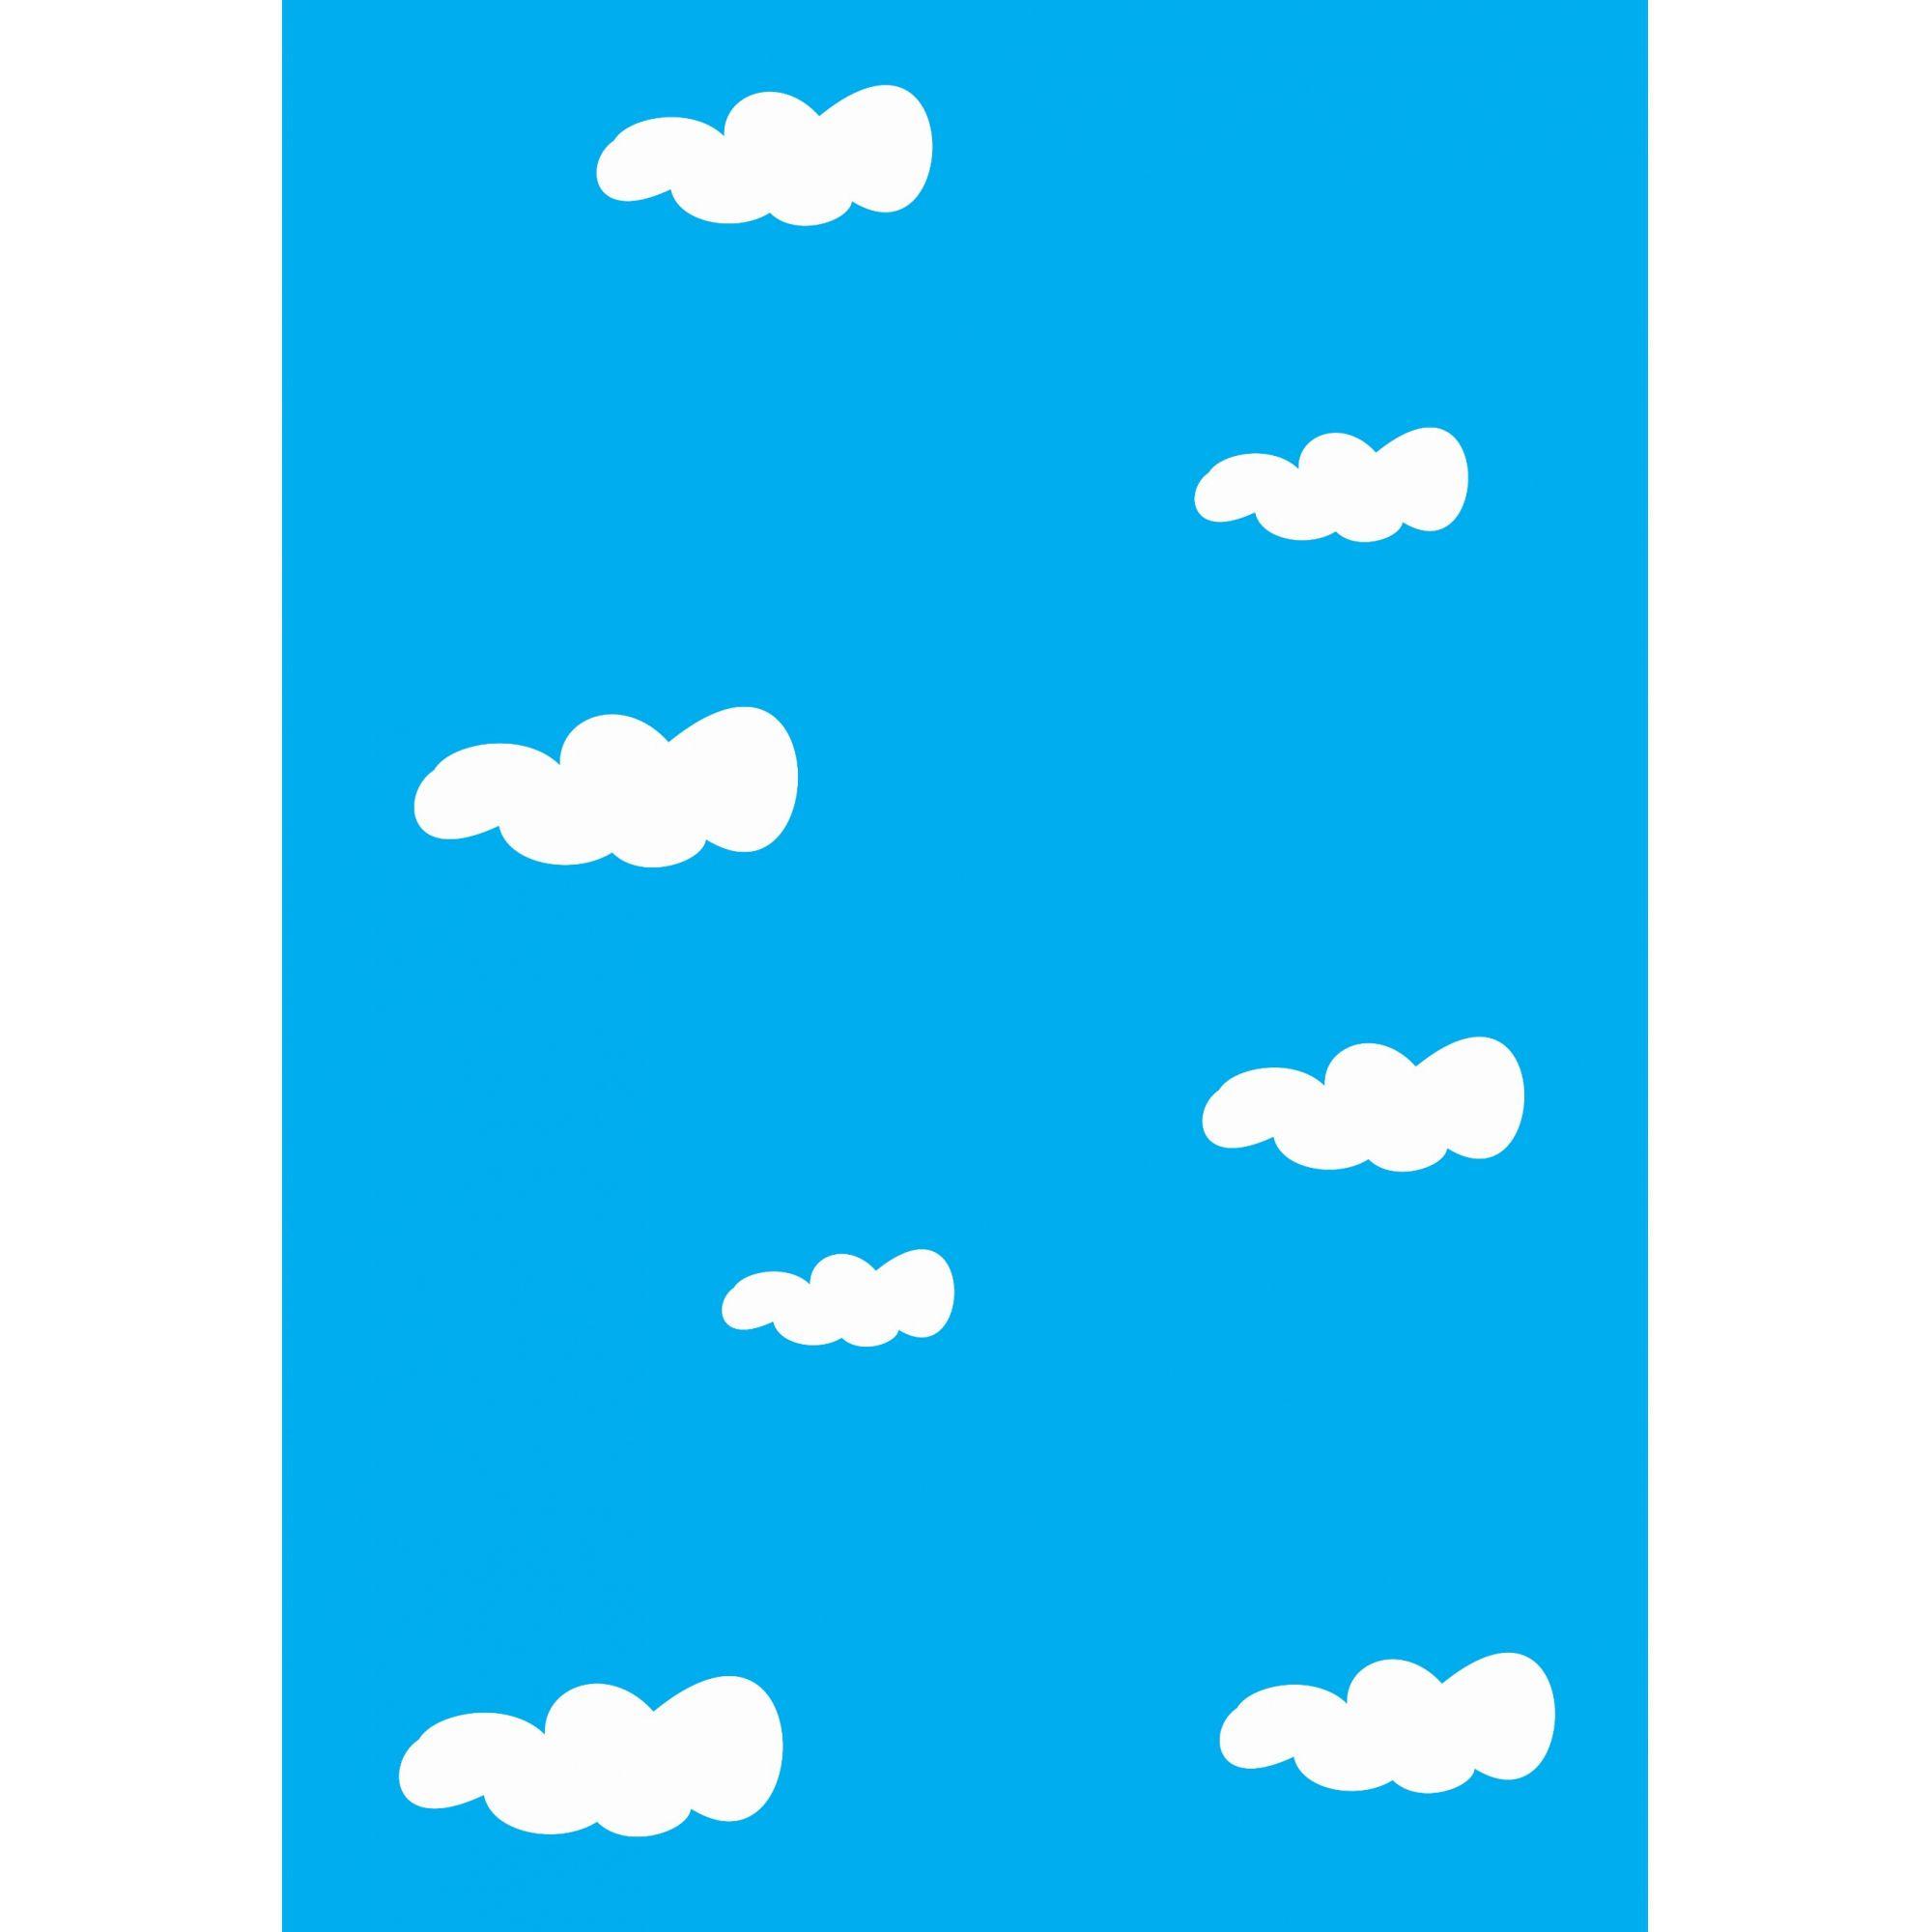 Papel de Parede Nuvem CO-221 Cole Aí